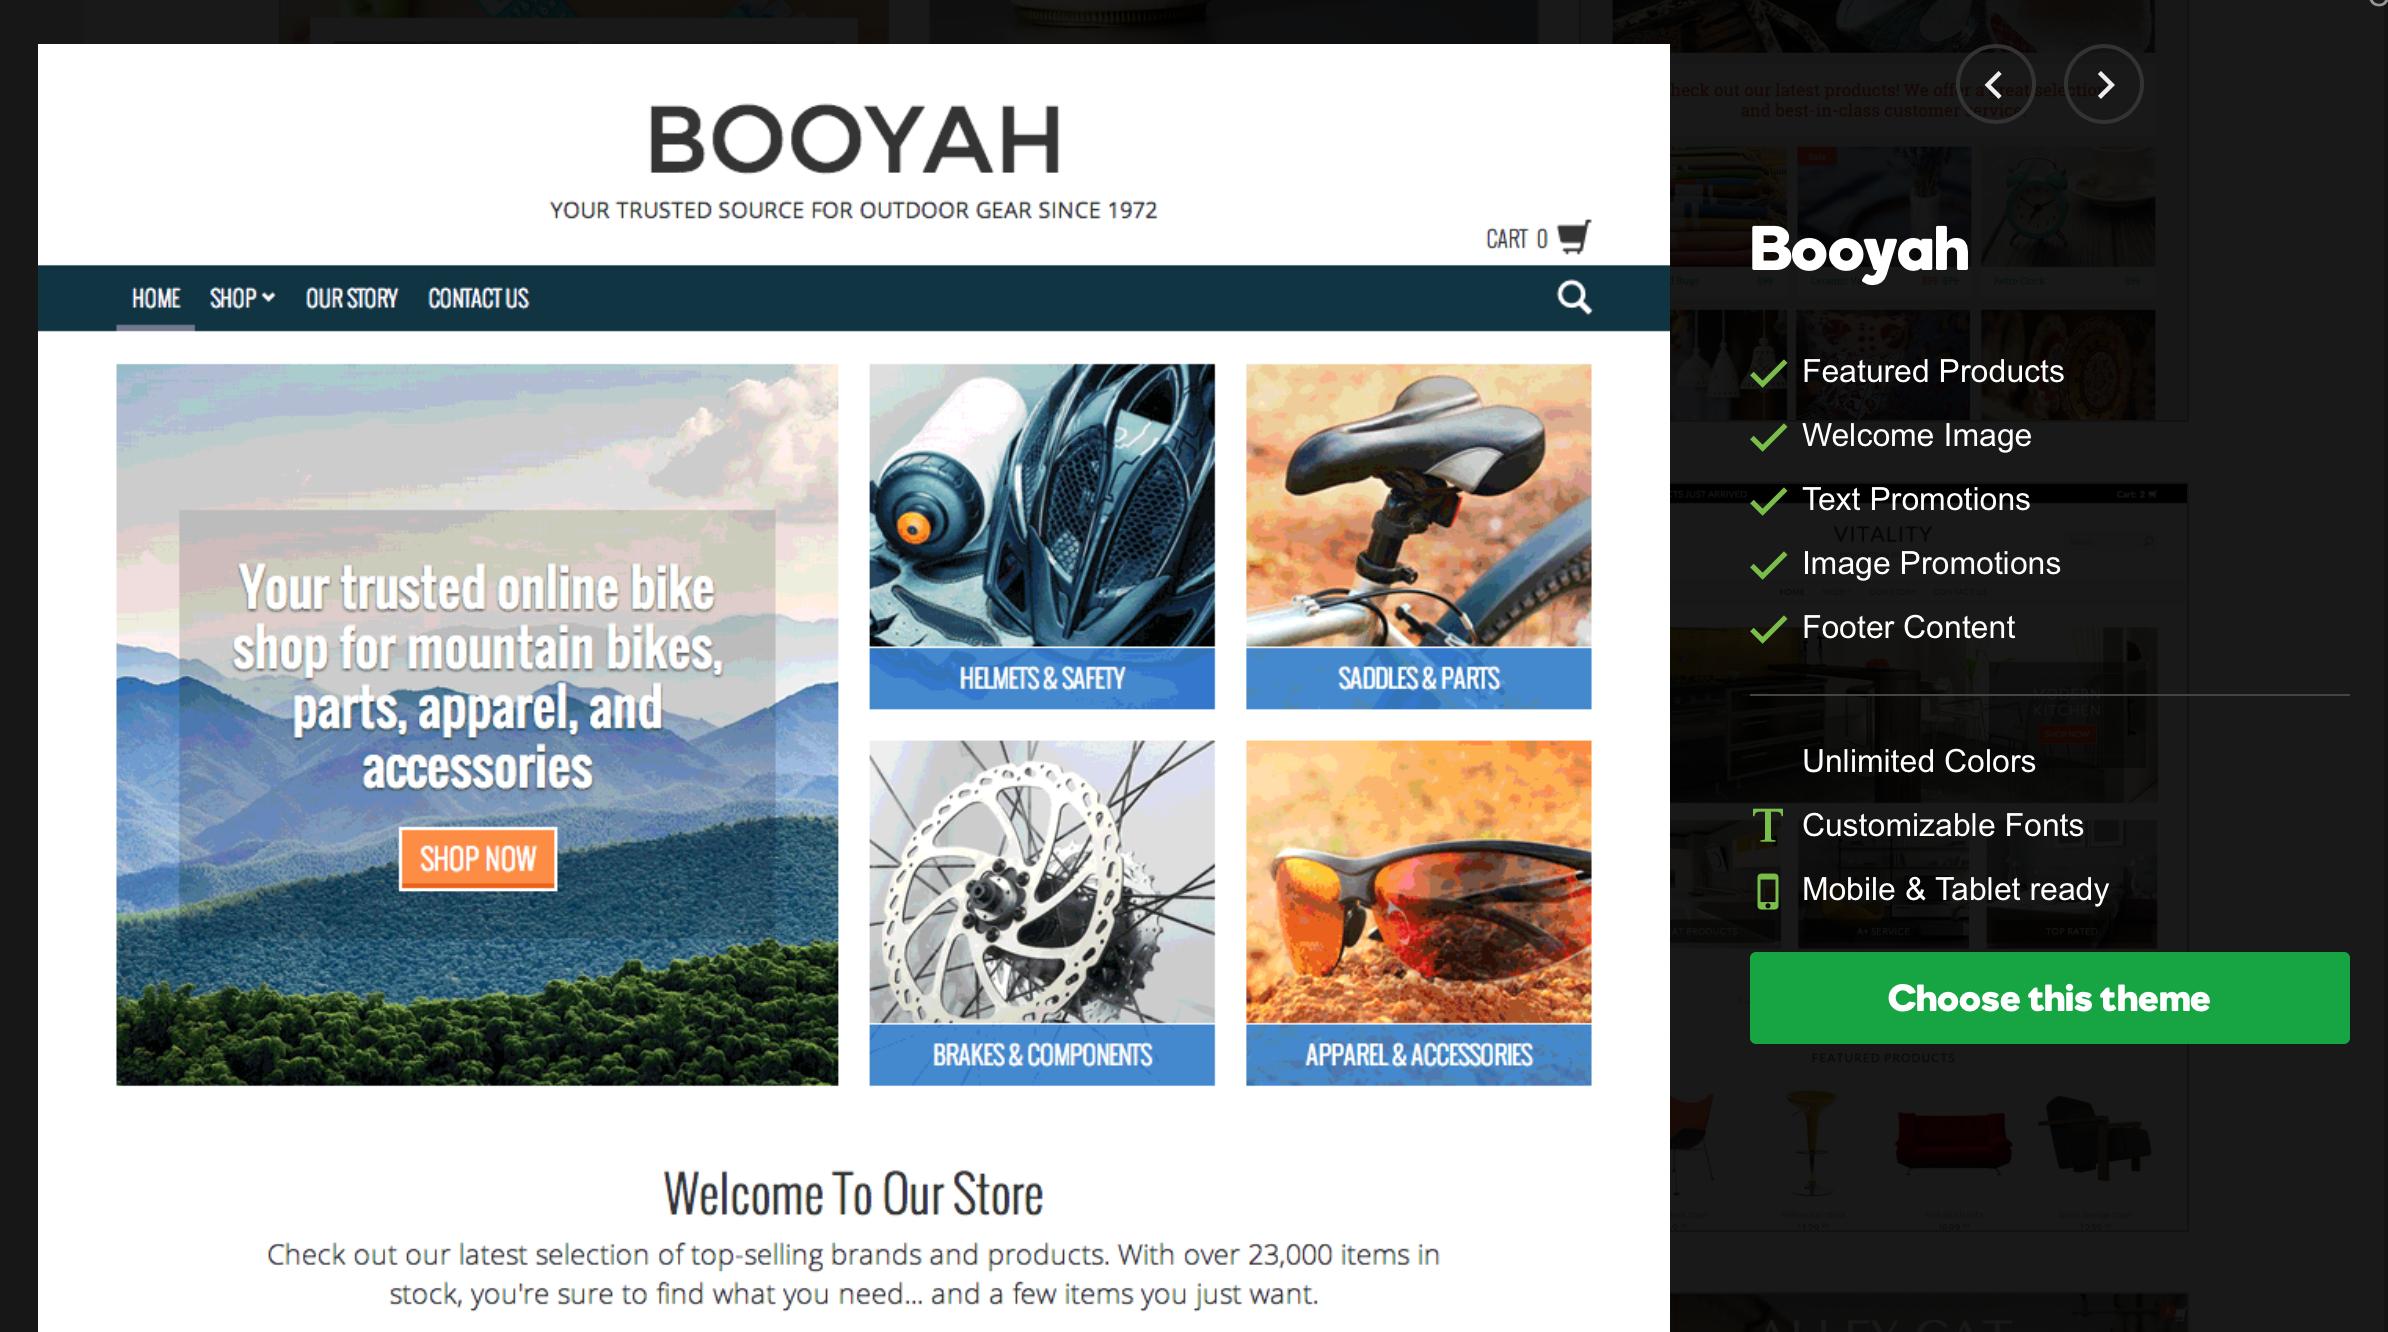 Godaddy Online Store Booyah Theme Gizmo Bolt Exposing